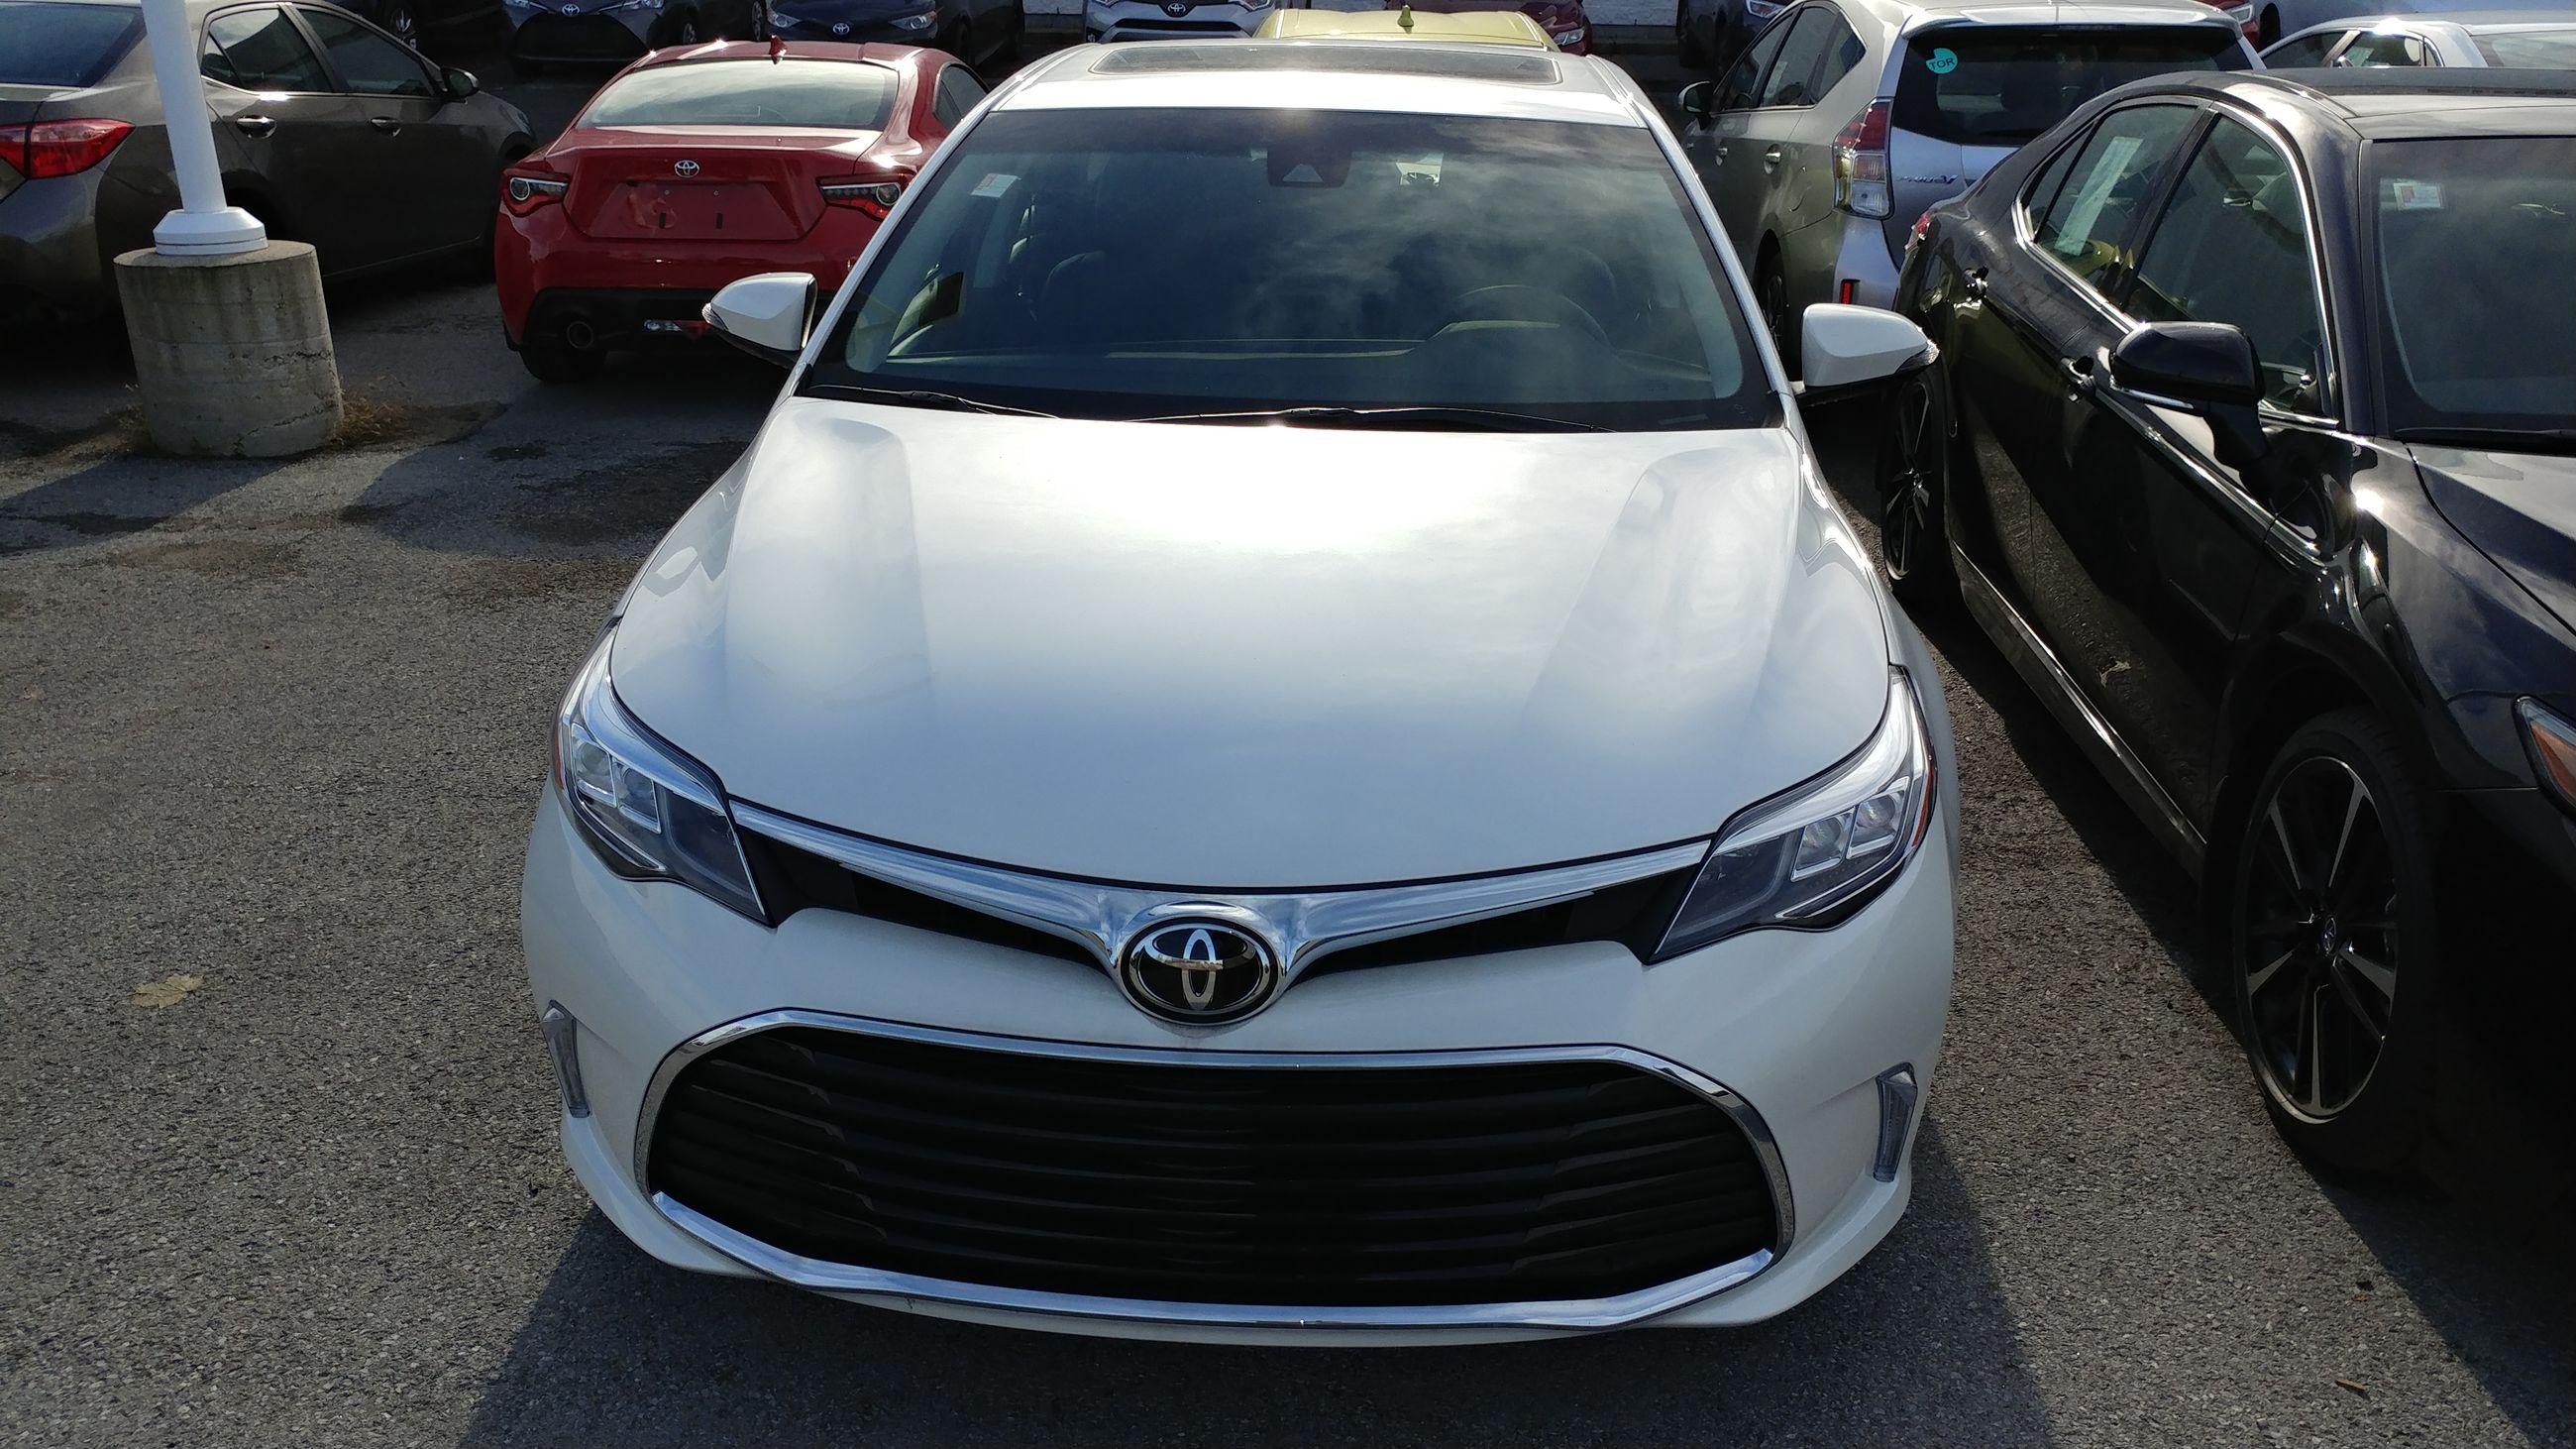 New 2018 Toyota Avalon For Sale Houston Tx: New 2018 Toyota Avalon For Sale In Kingston